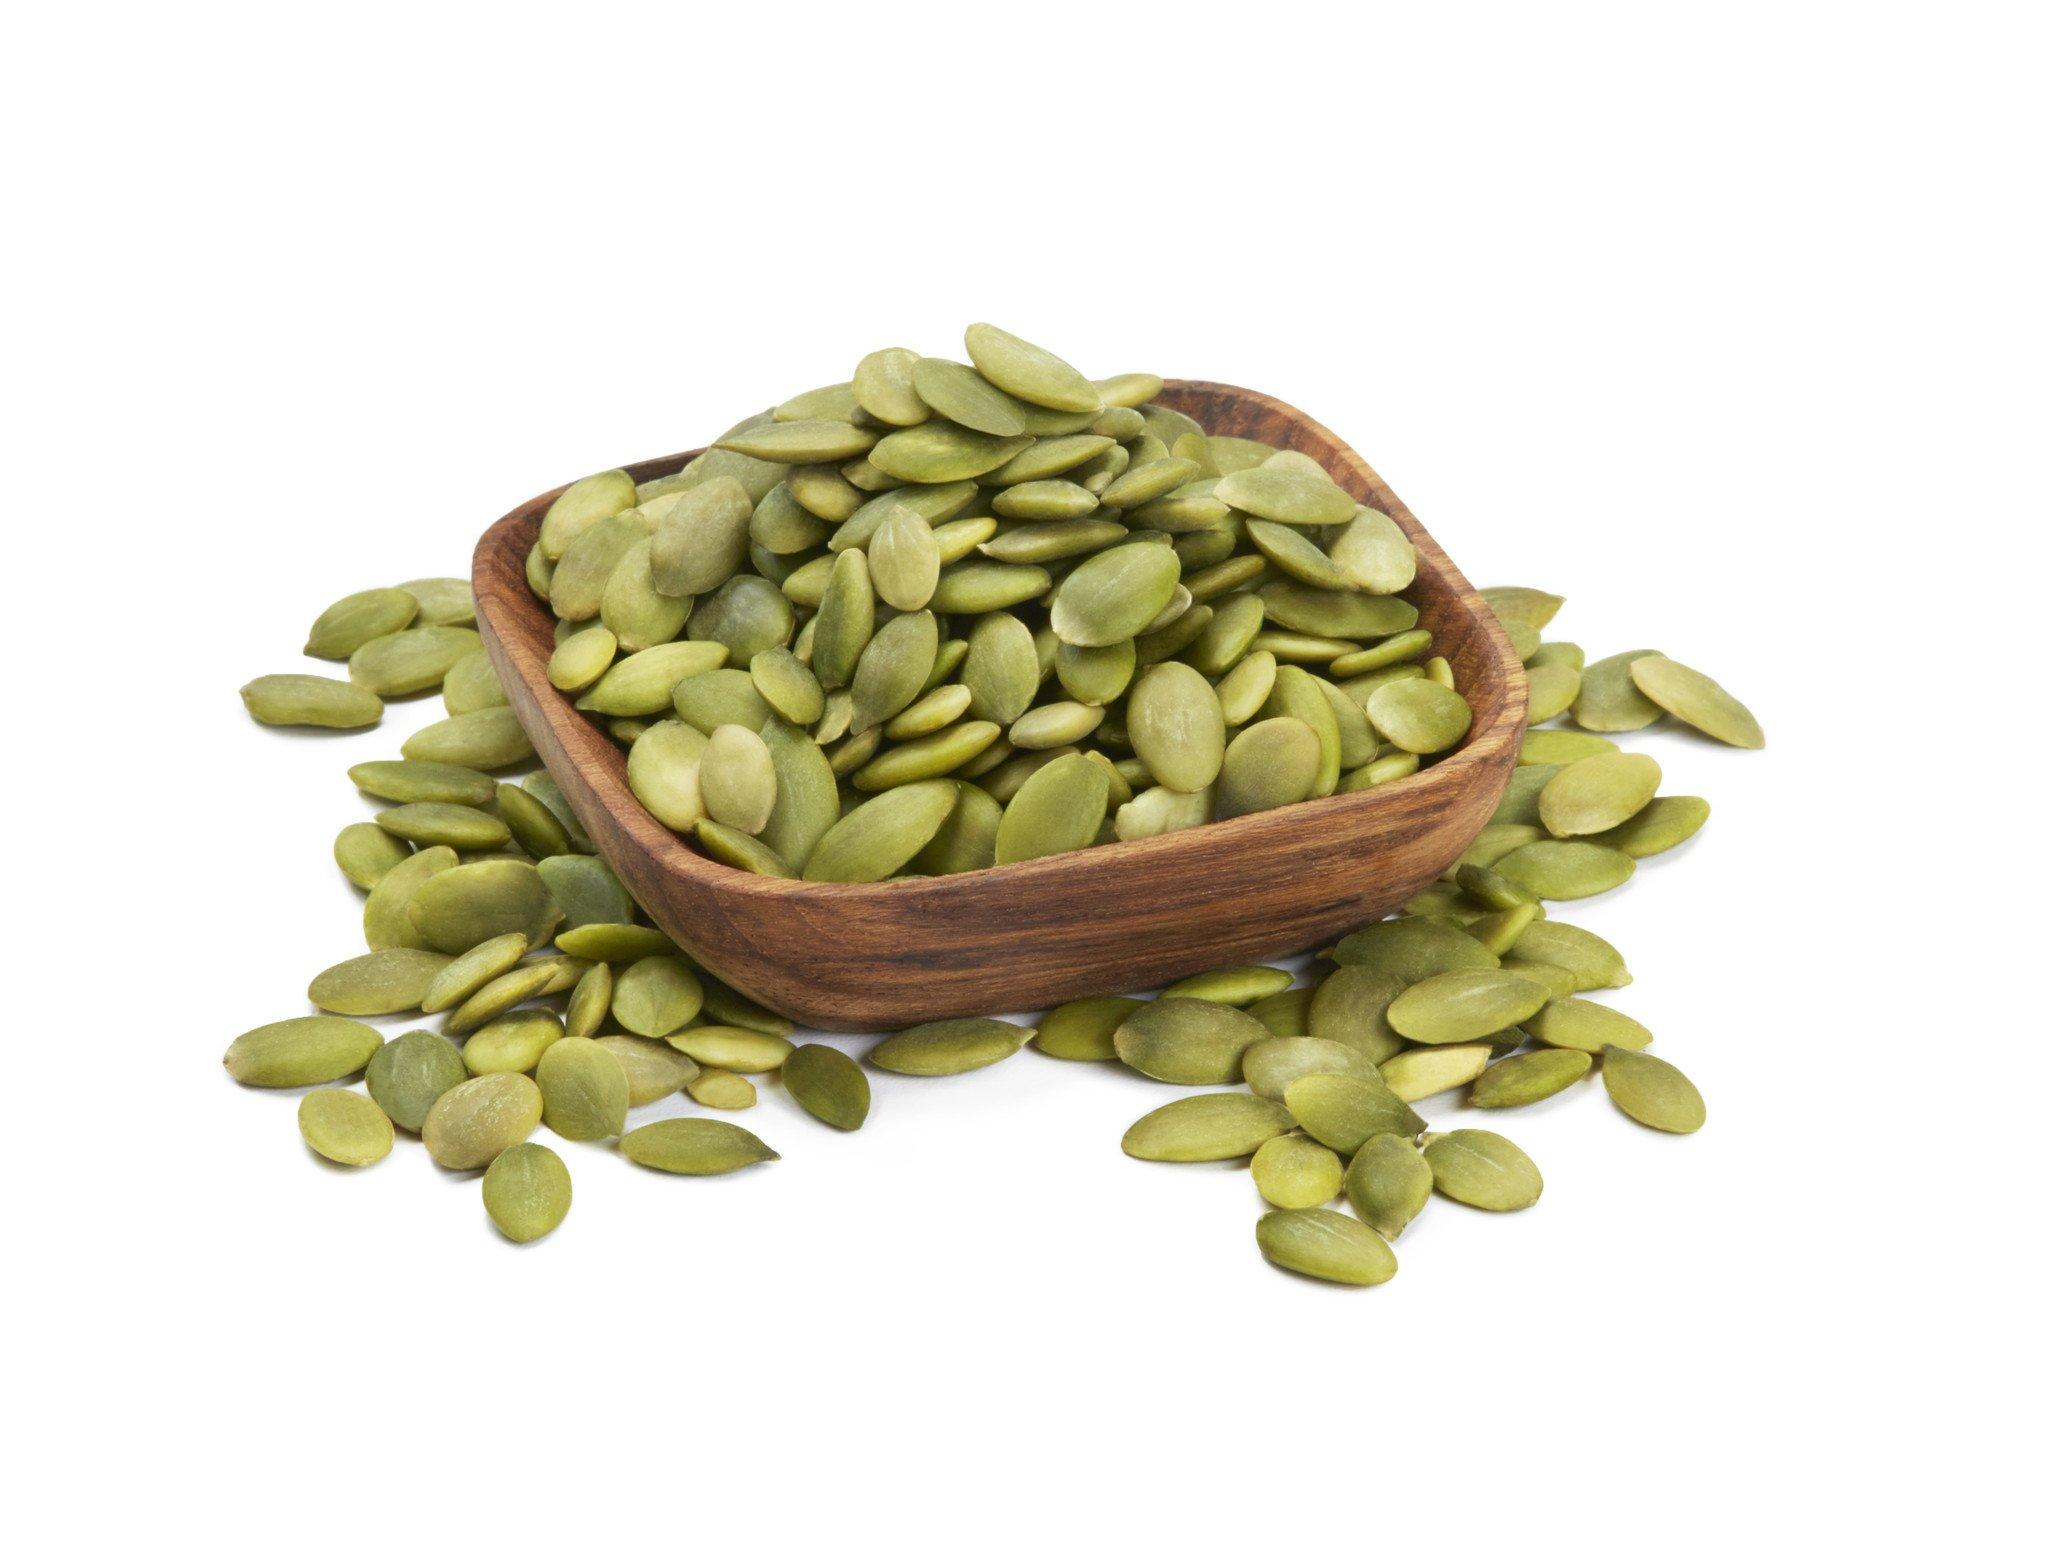 8. تخمه کدو - منبع پروتئین گیاهی